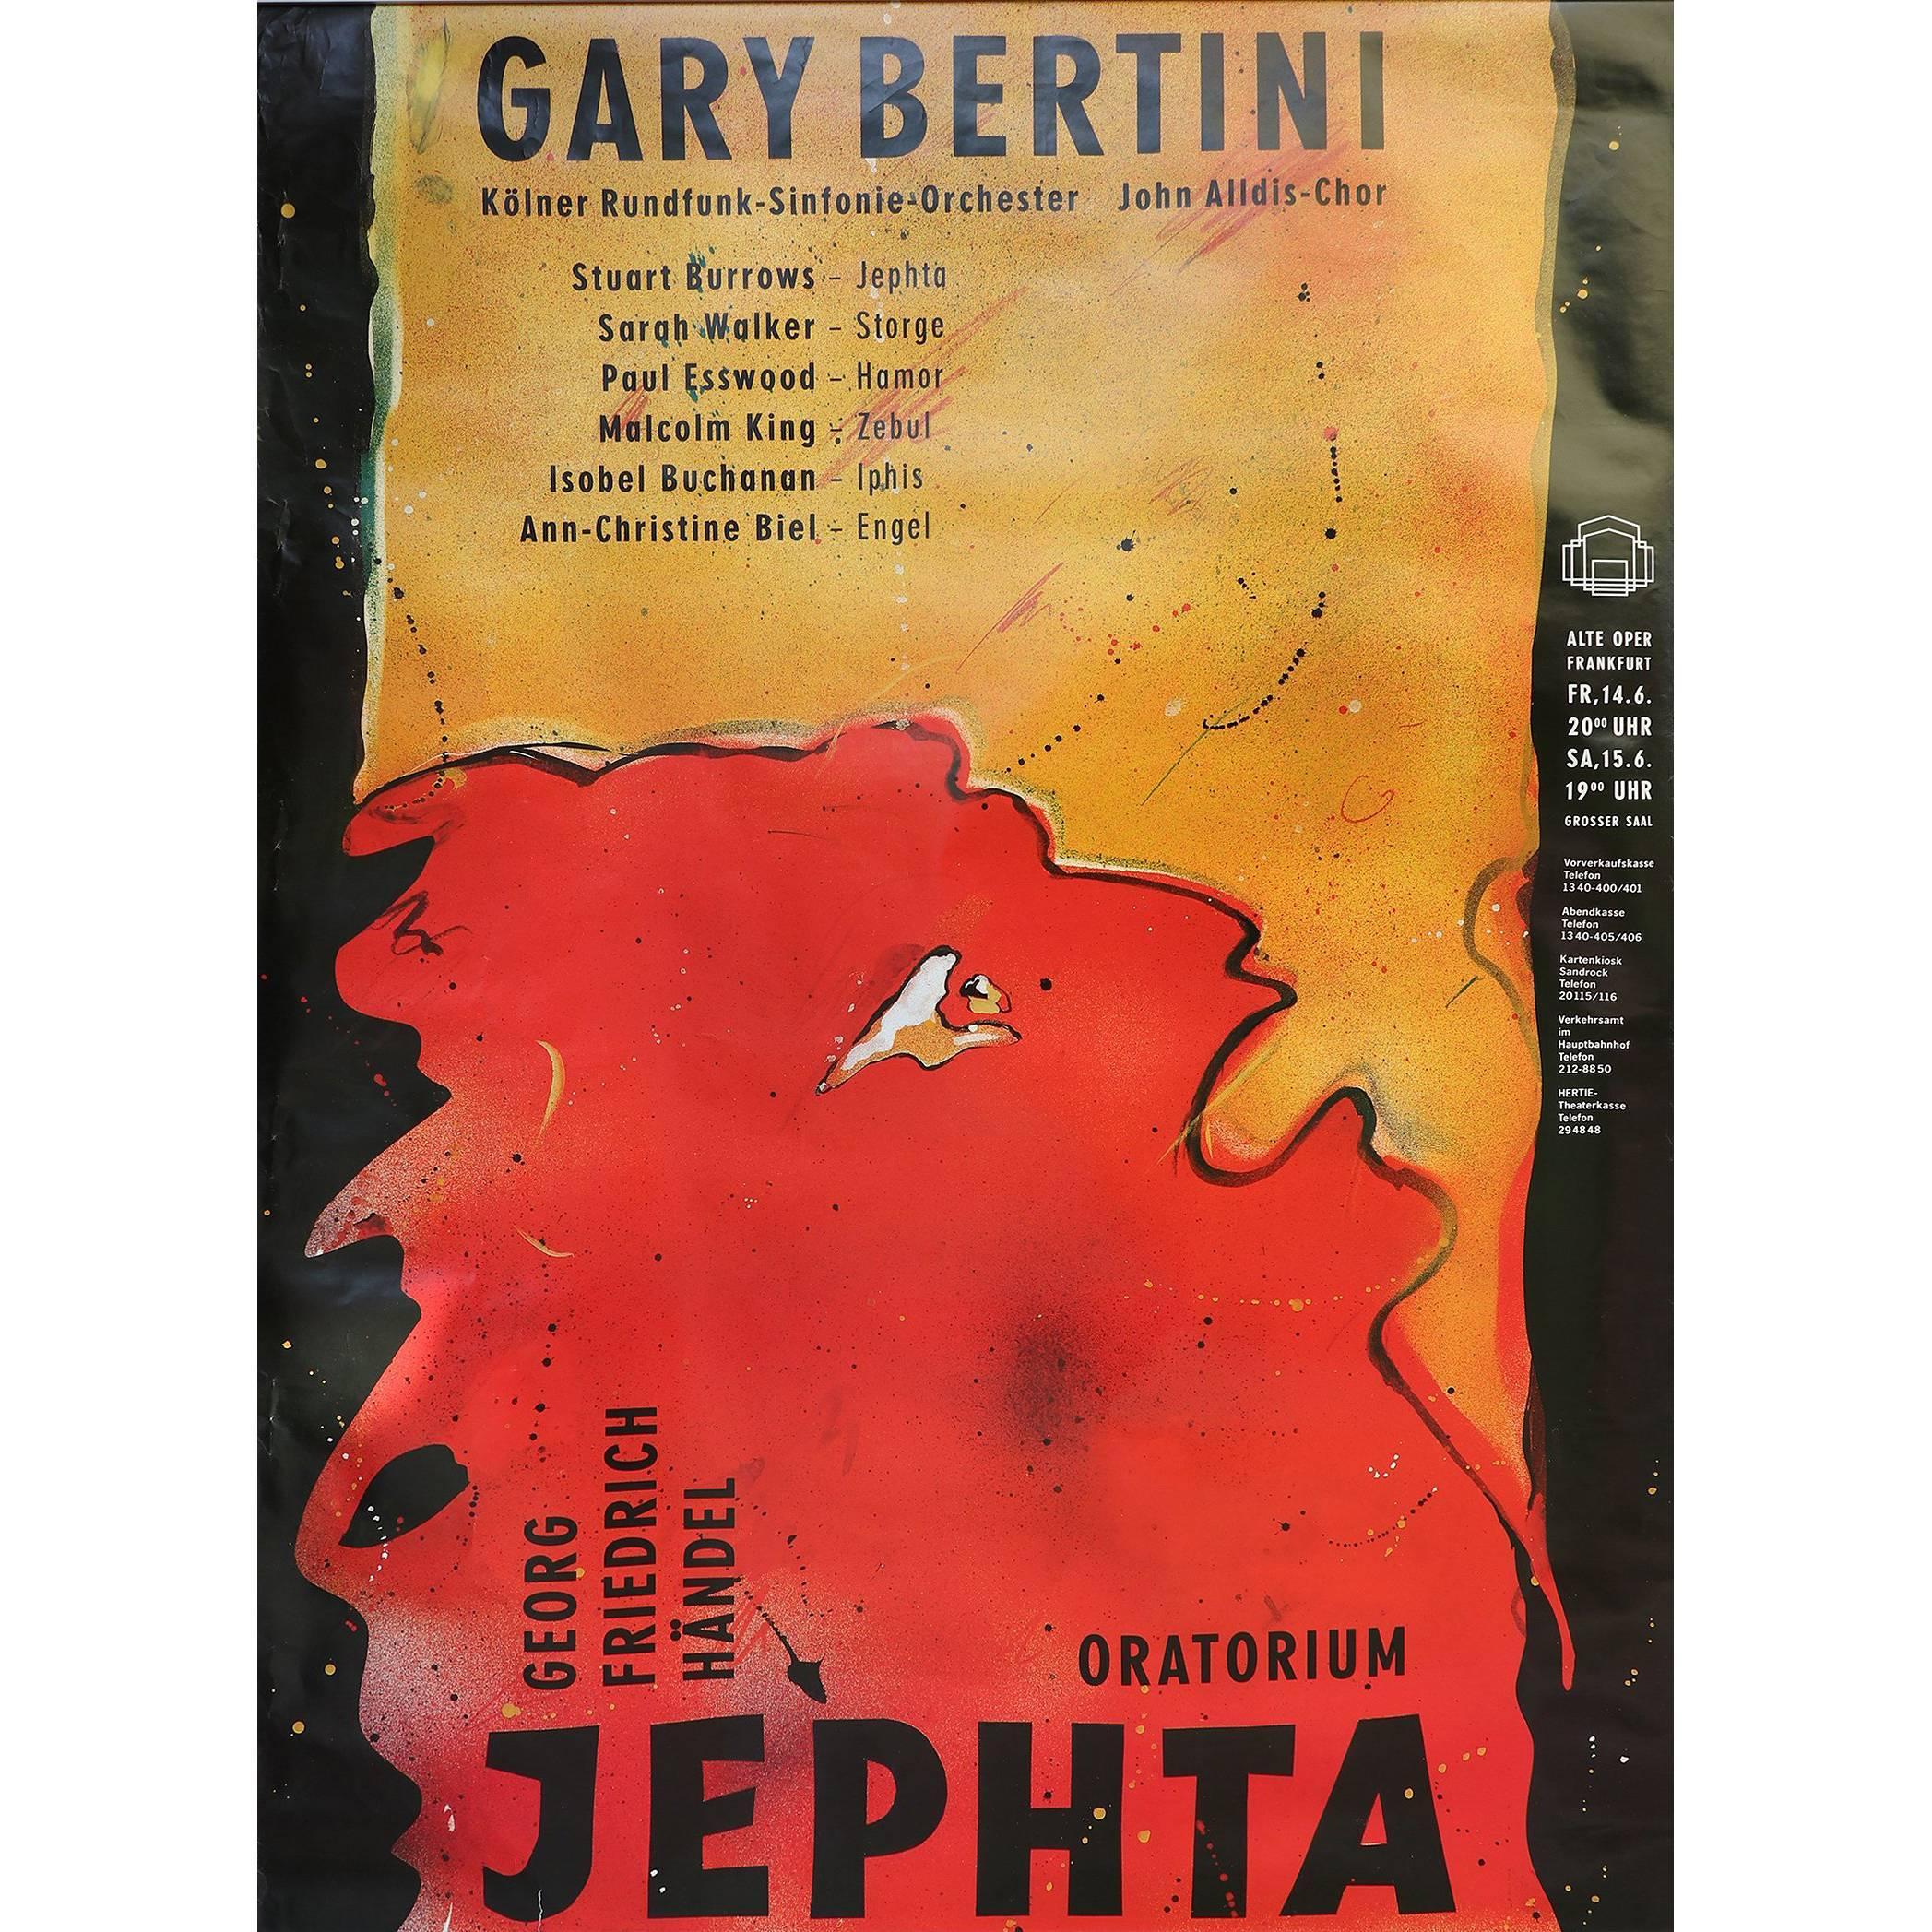 """Gary Bertini - Jephta"", Concert Poster 1985 Alte Oper Frankfurt, Germany"